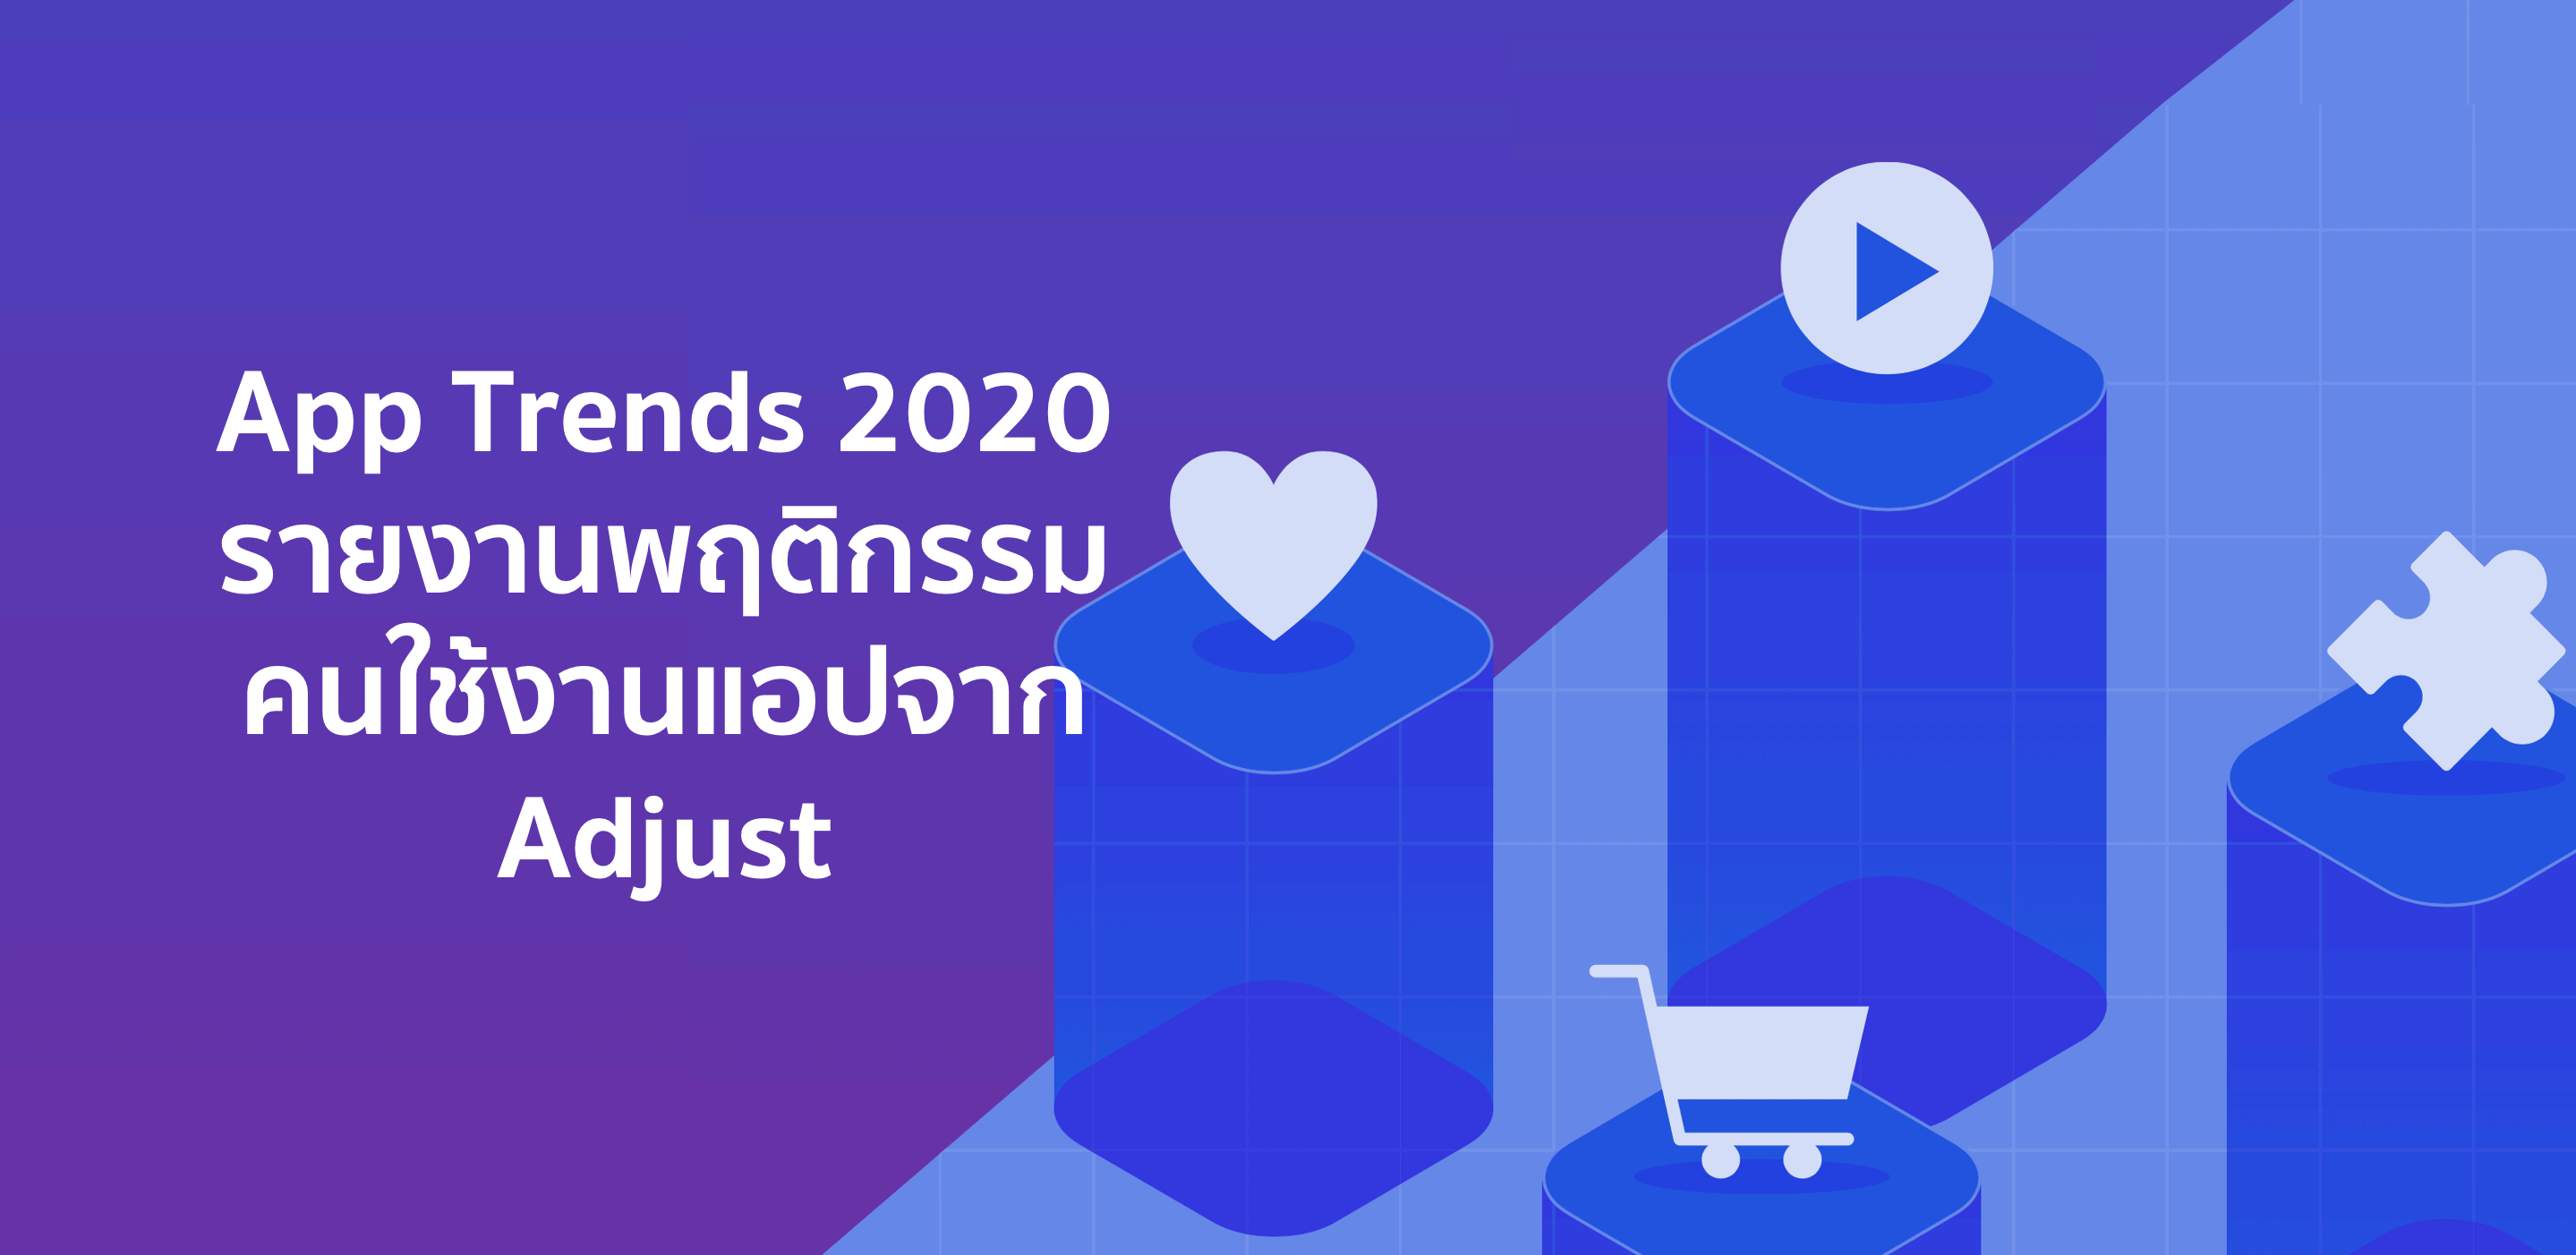 App Trends 2020 – Report Performance ของแอปปี 2020